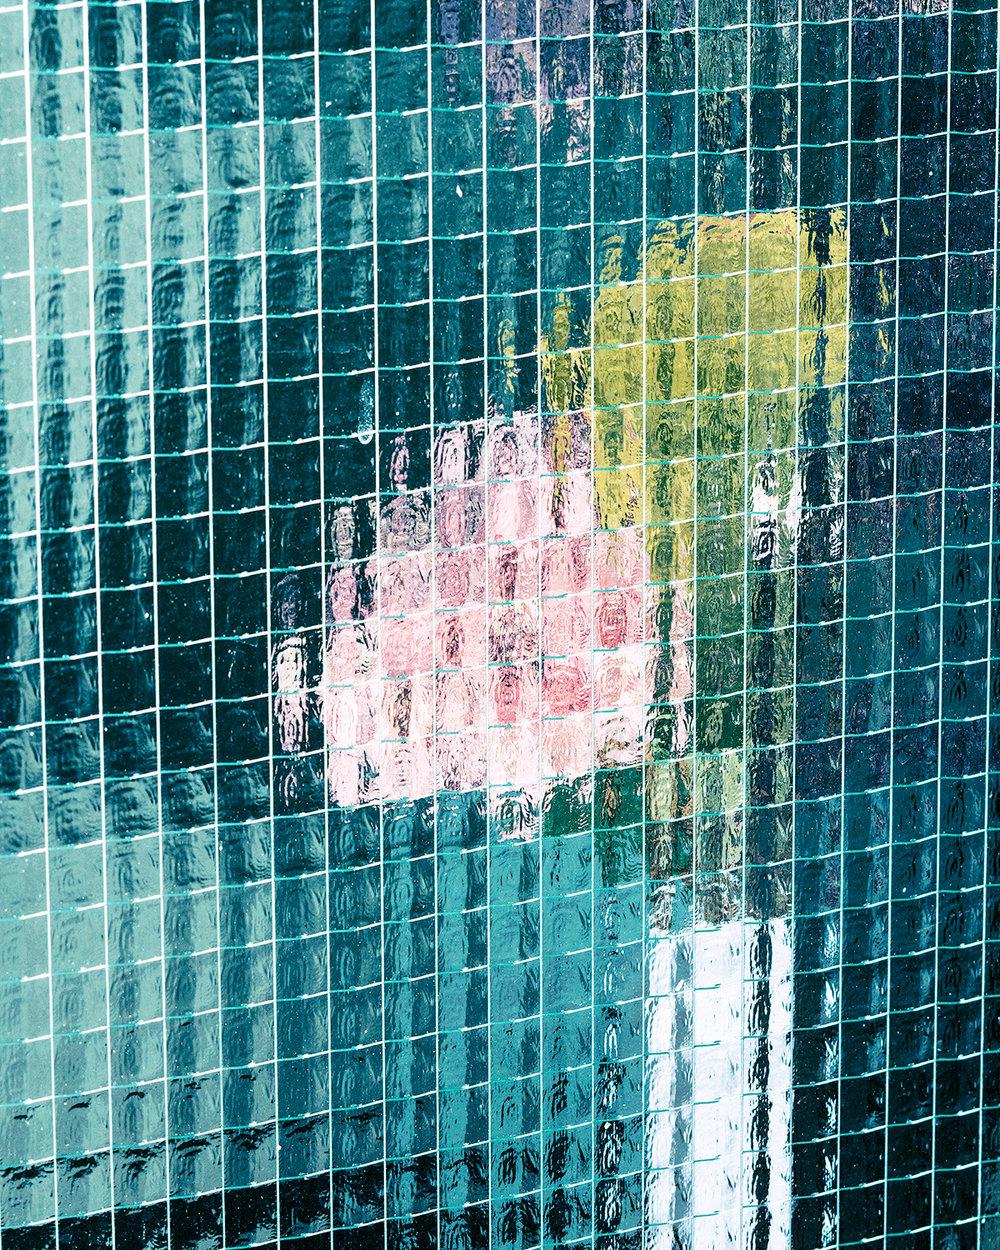 Eclectic Aproaches - Erli Grünzweil